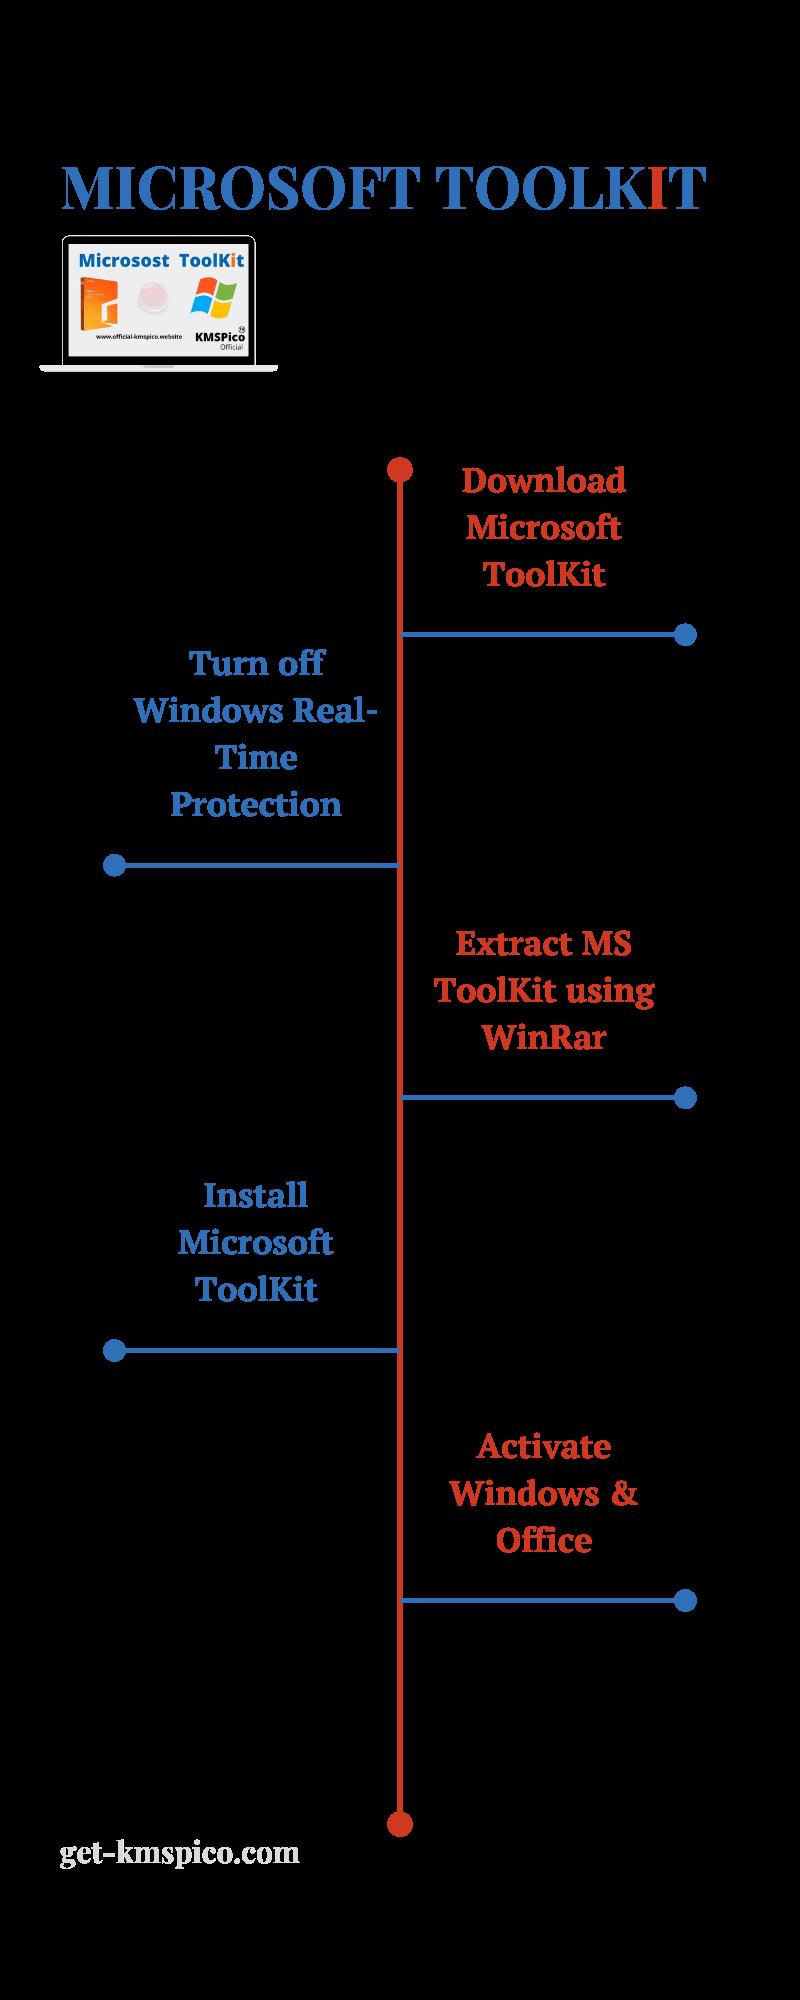 Microsoft-Toolkit-Infographic